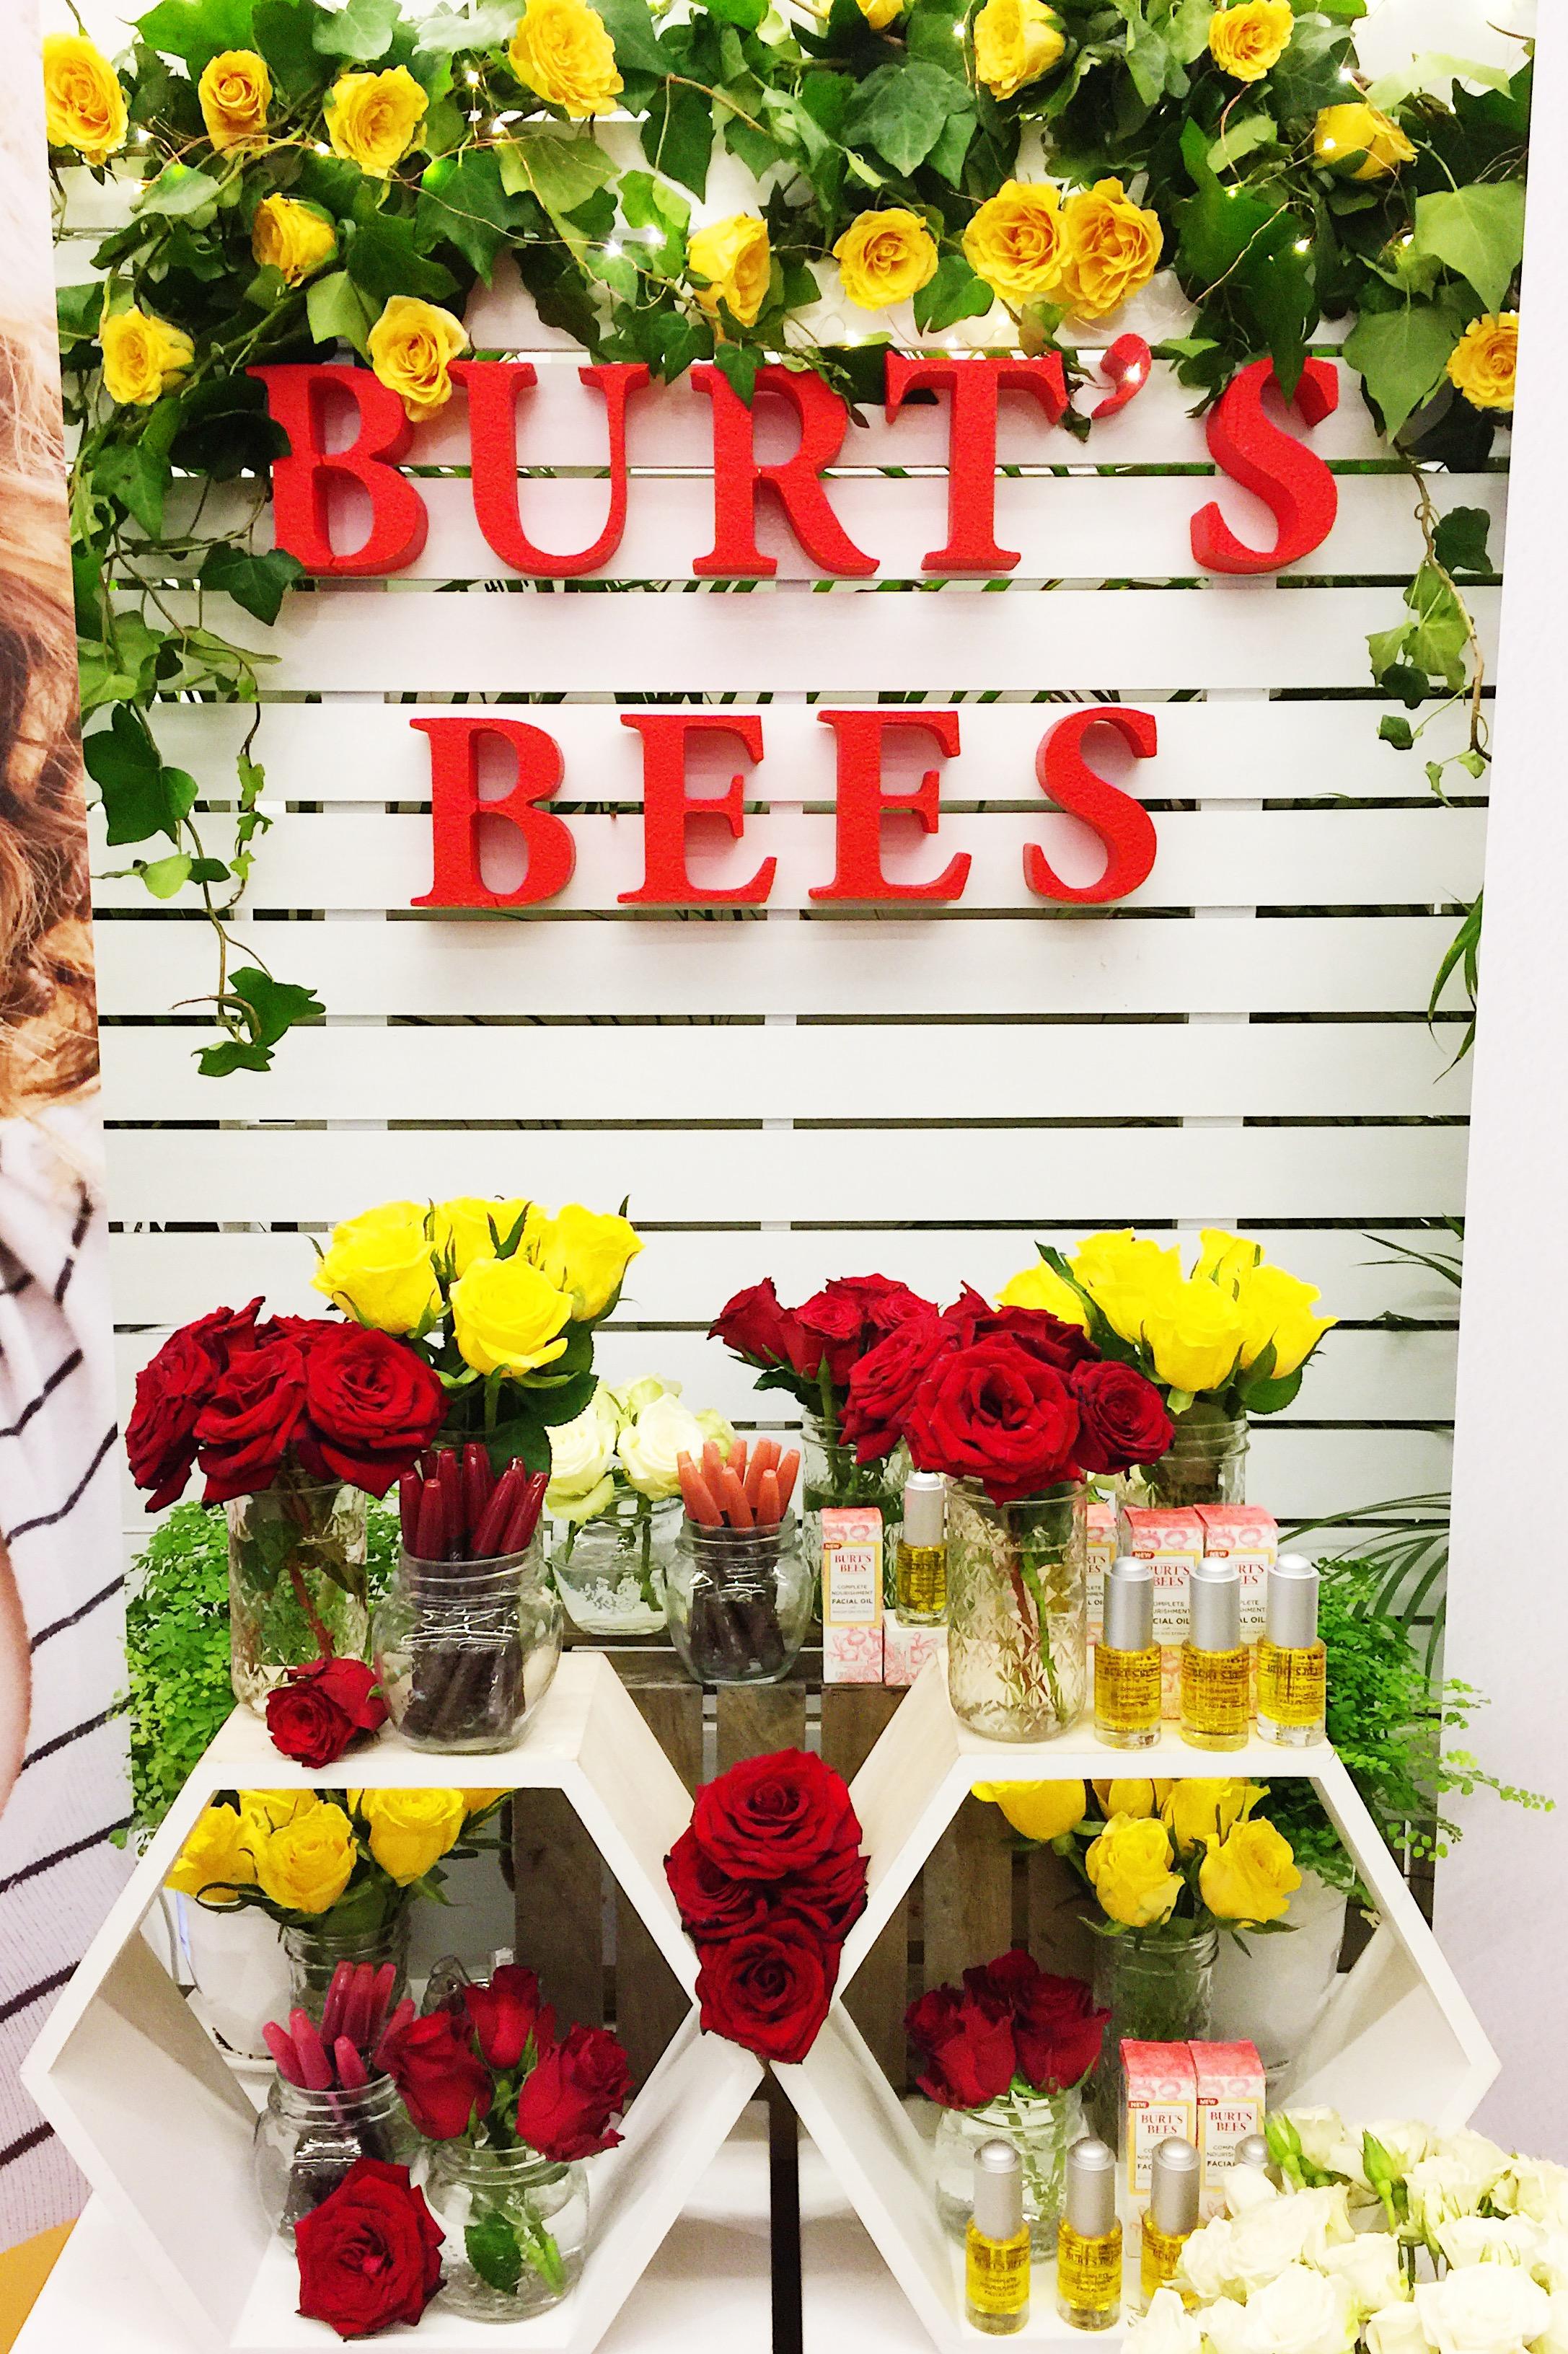 Marisa Robinson Beauty Blogger Priceline: The Beauty Prescription Event 2017 Burt's Bees